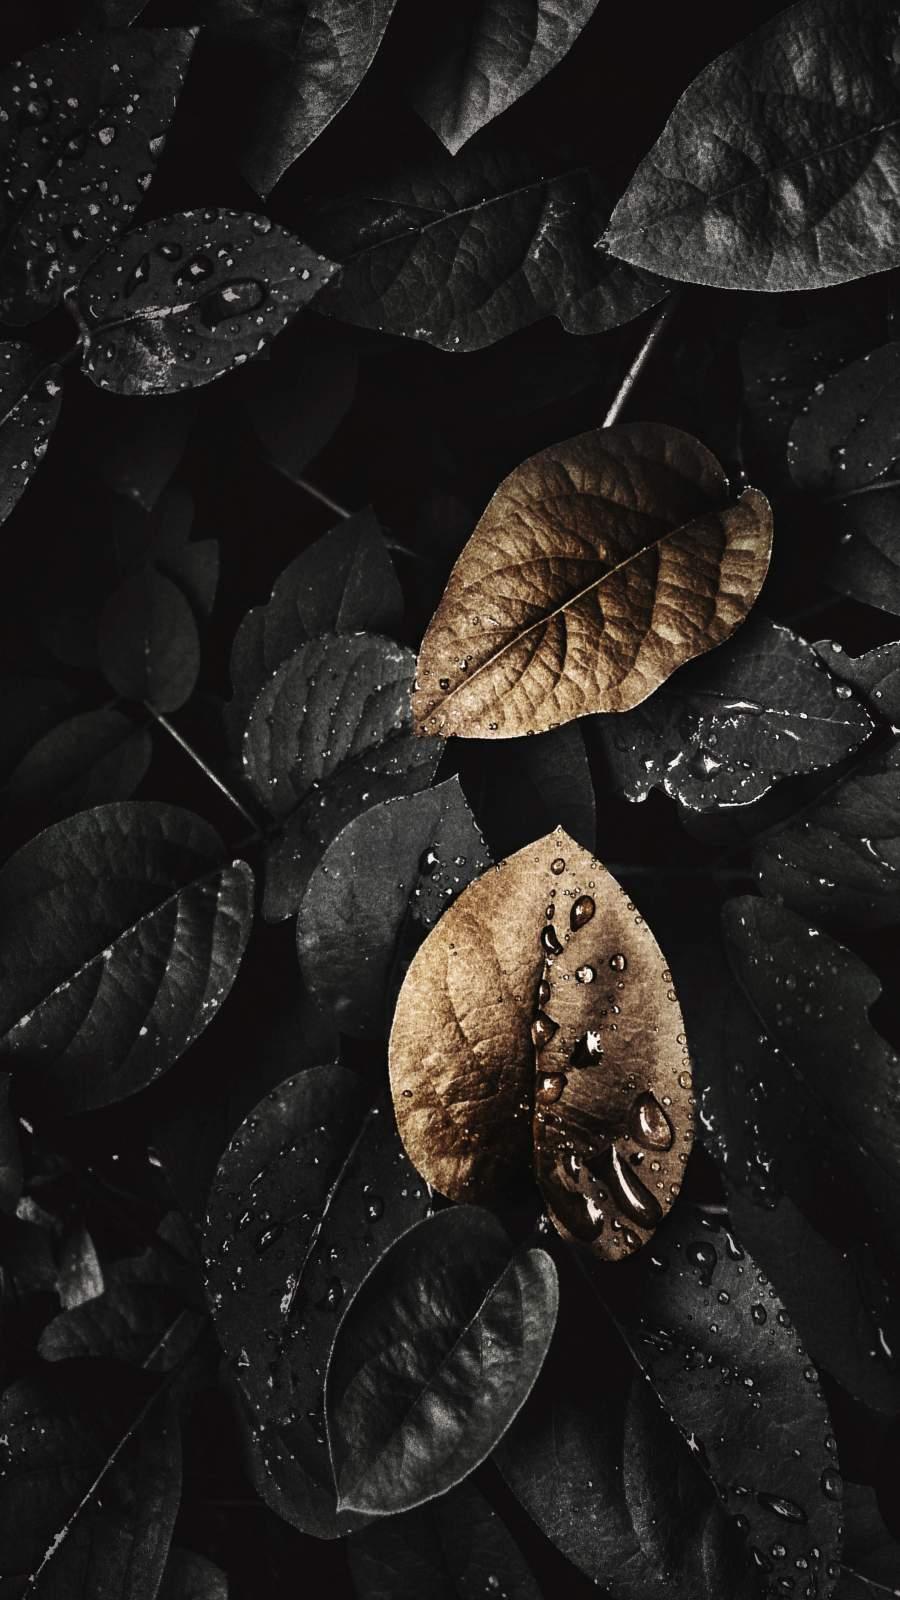 Dark Nature Foliage iPhone Wallpaper